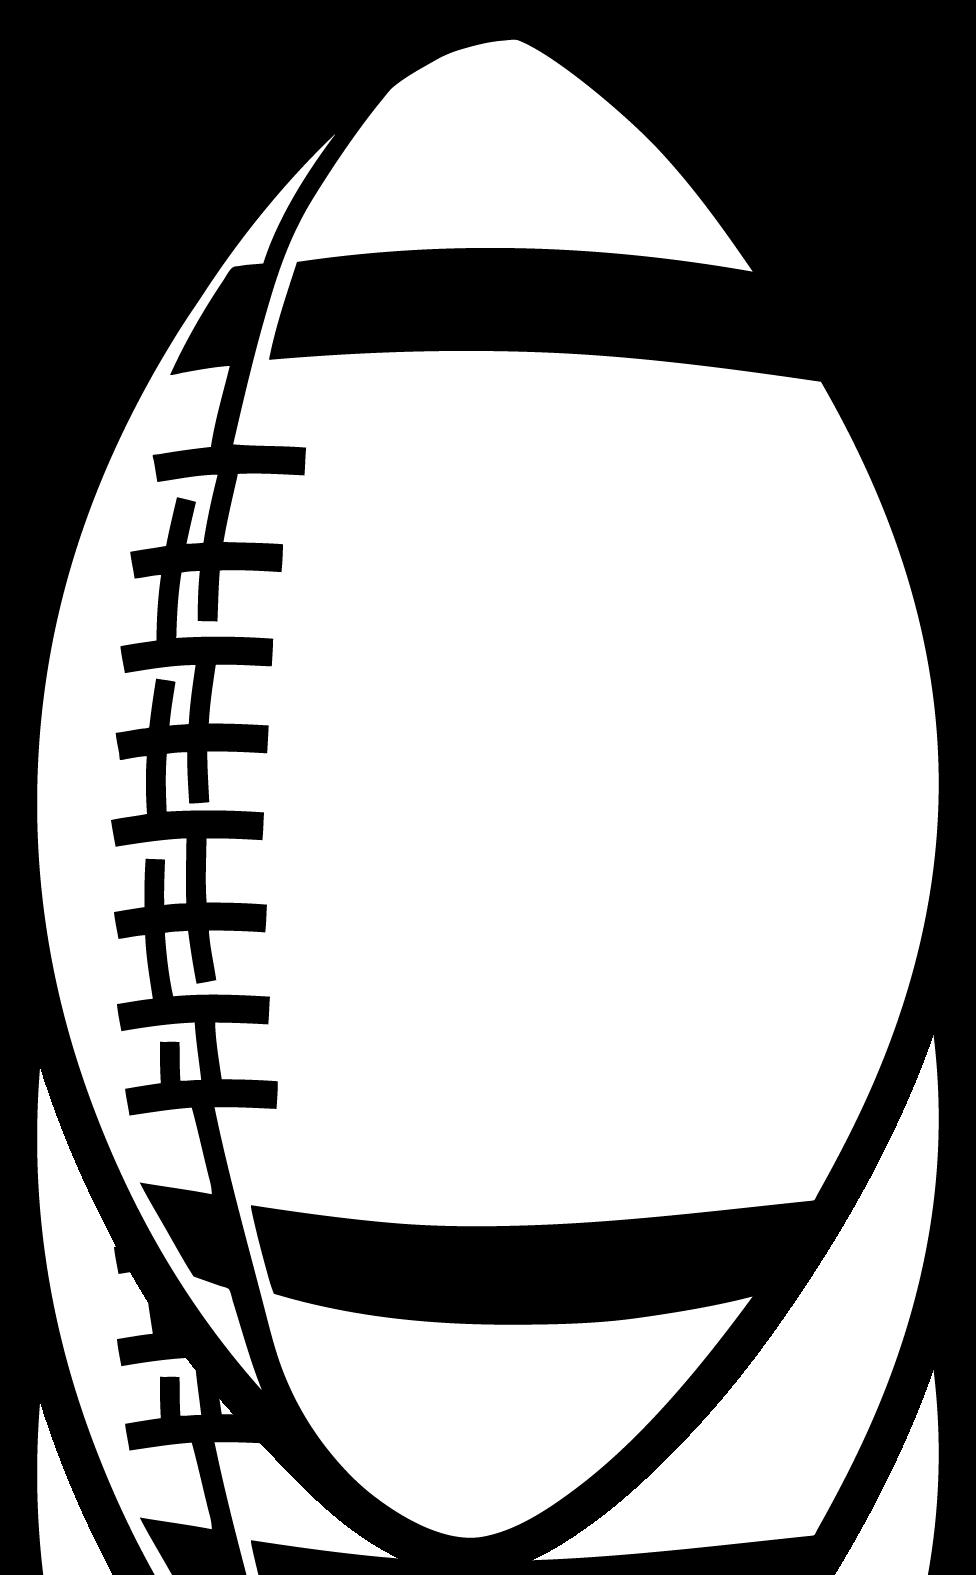 Football outline clipart 5